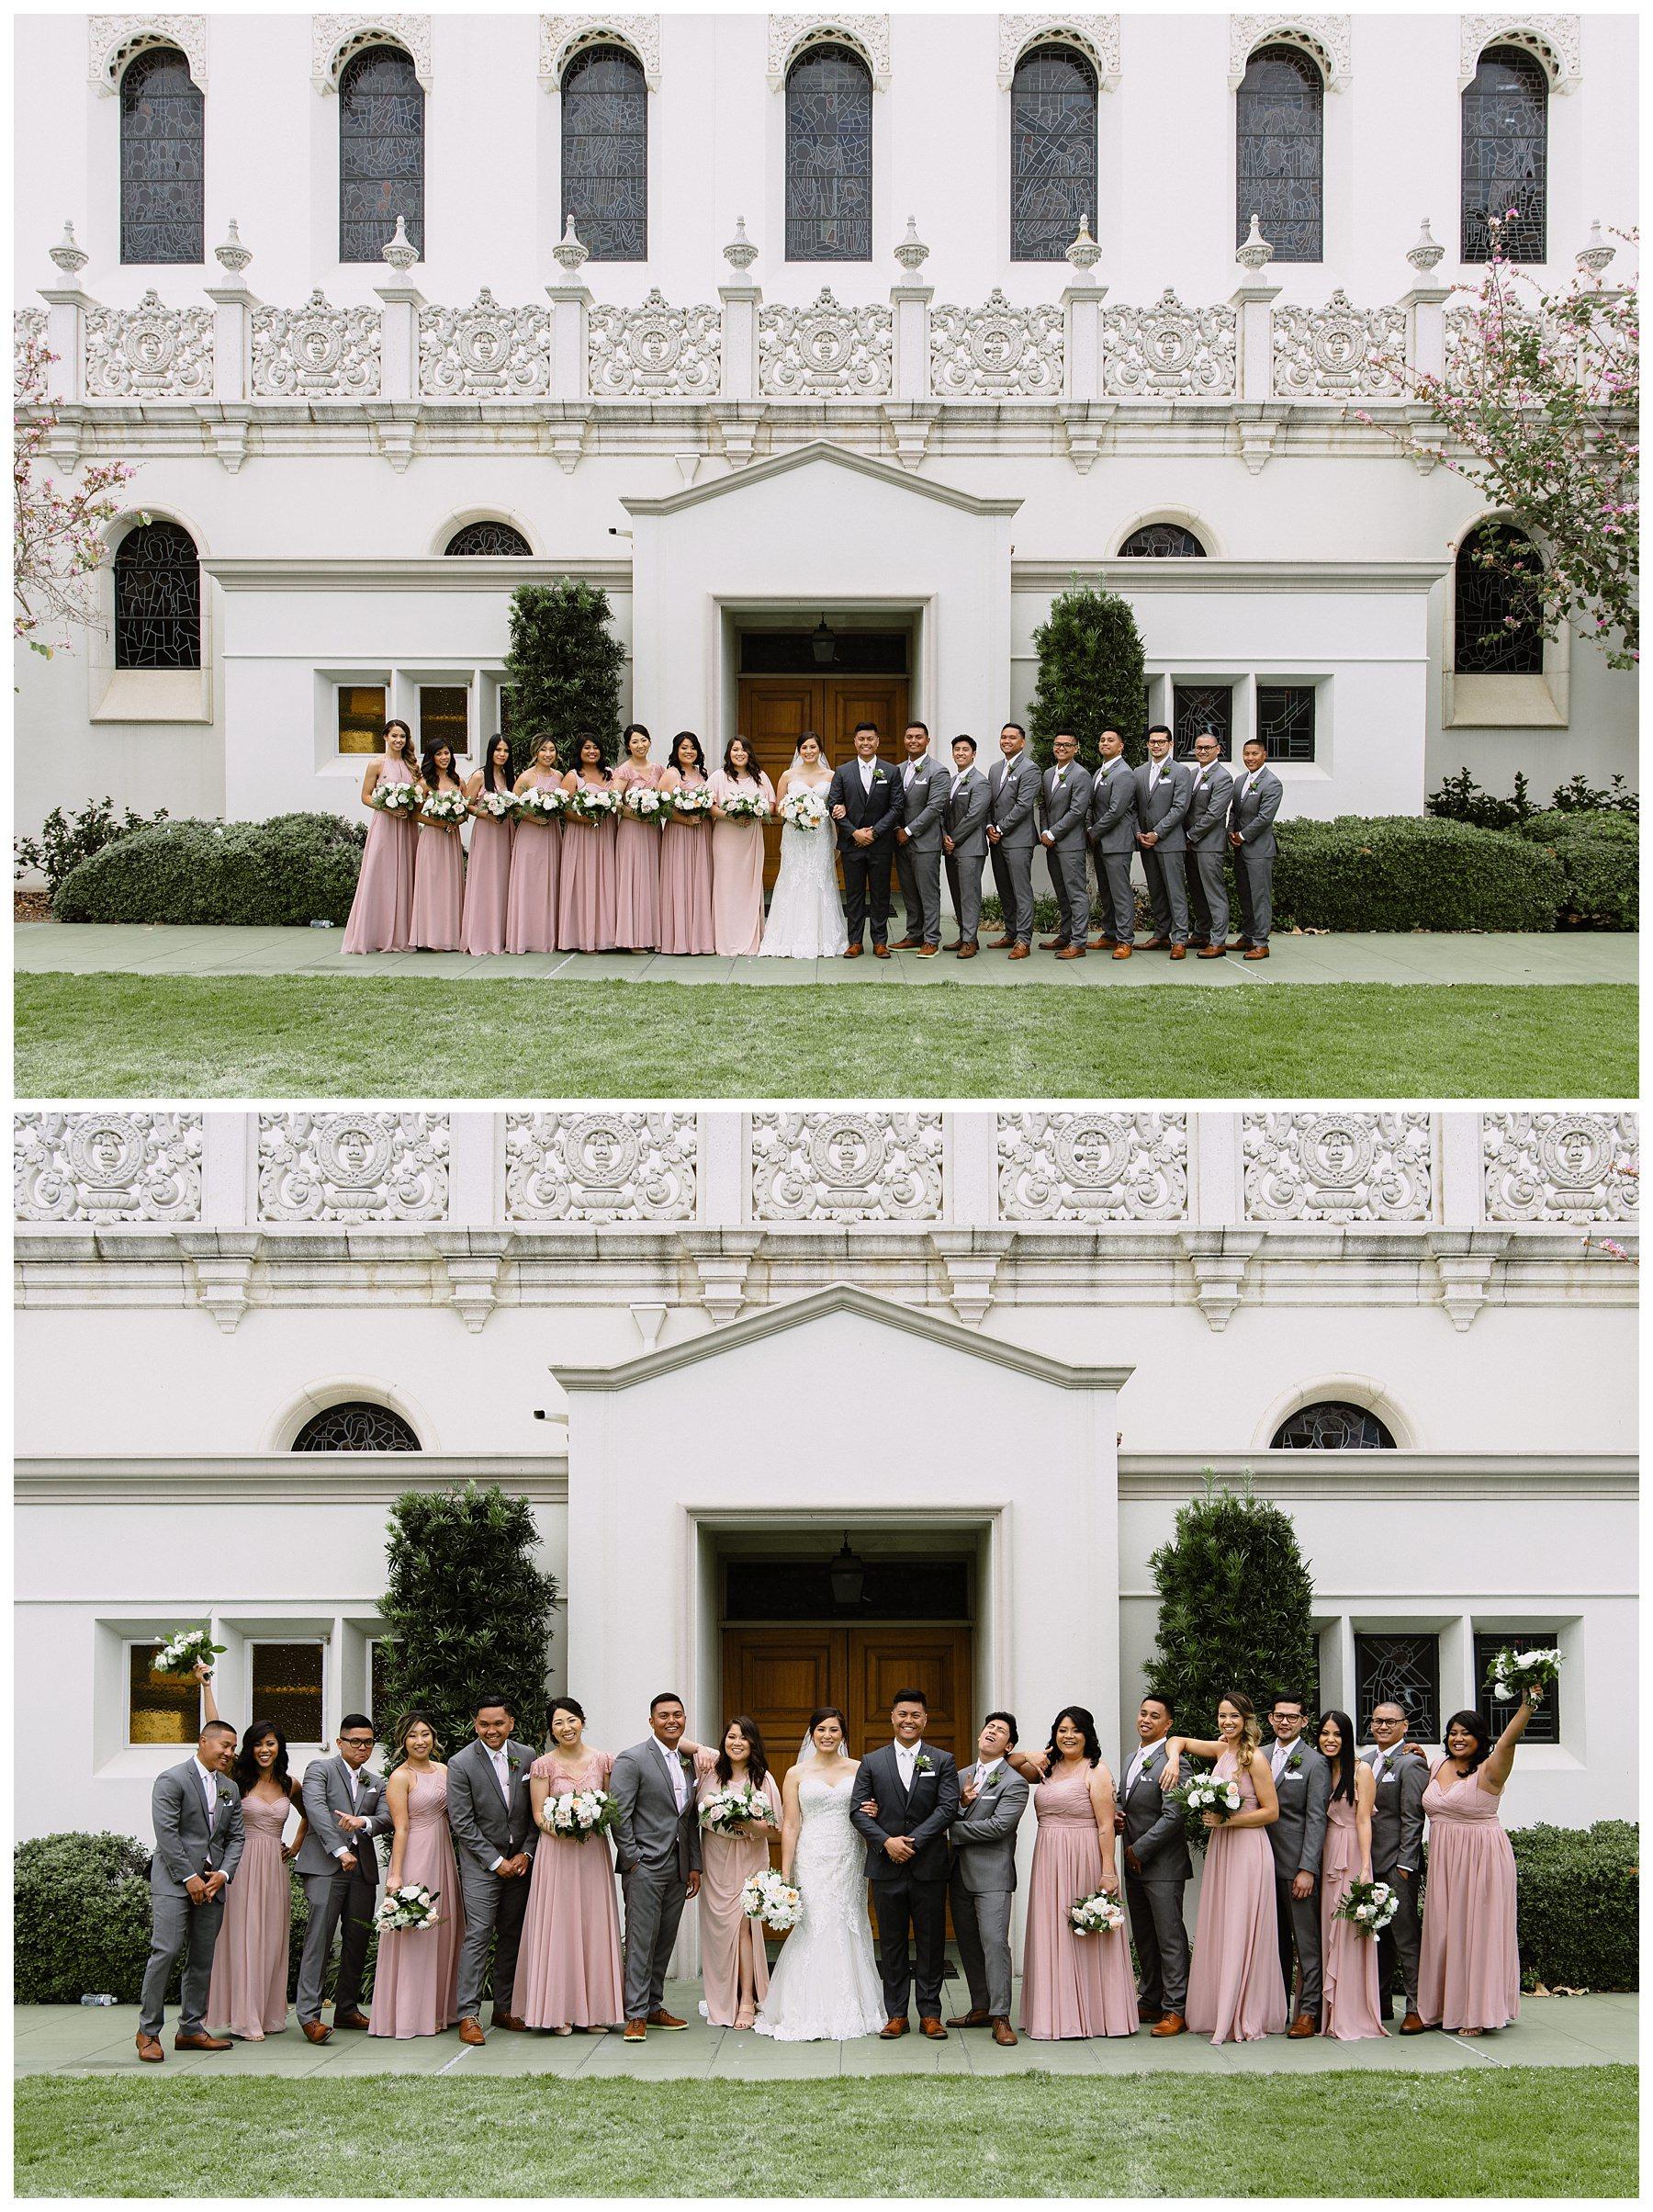 Brick_San_Diego_wedding_0030.jpg